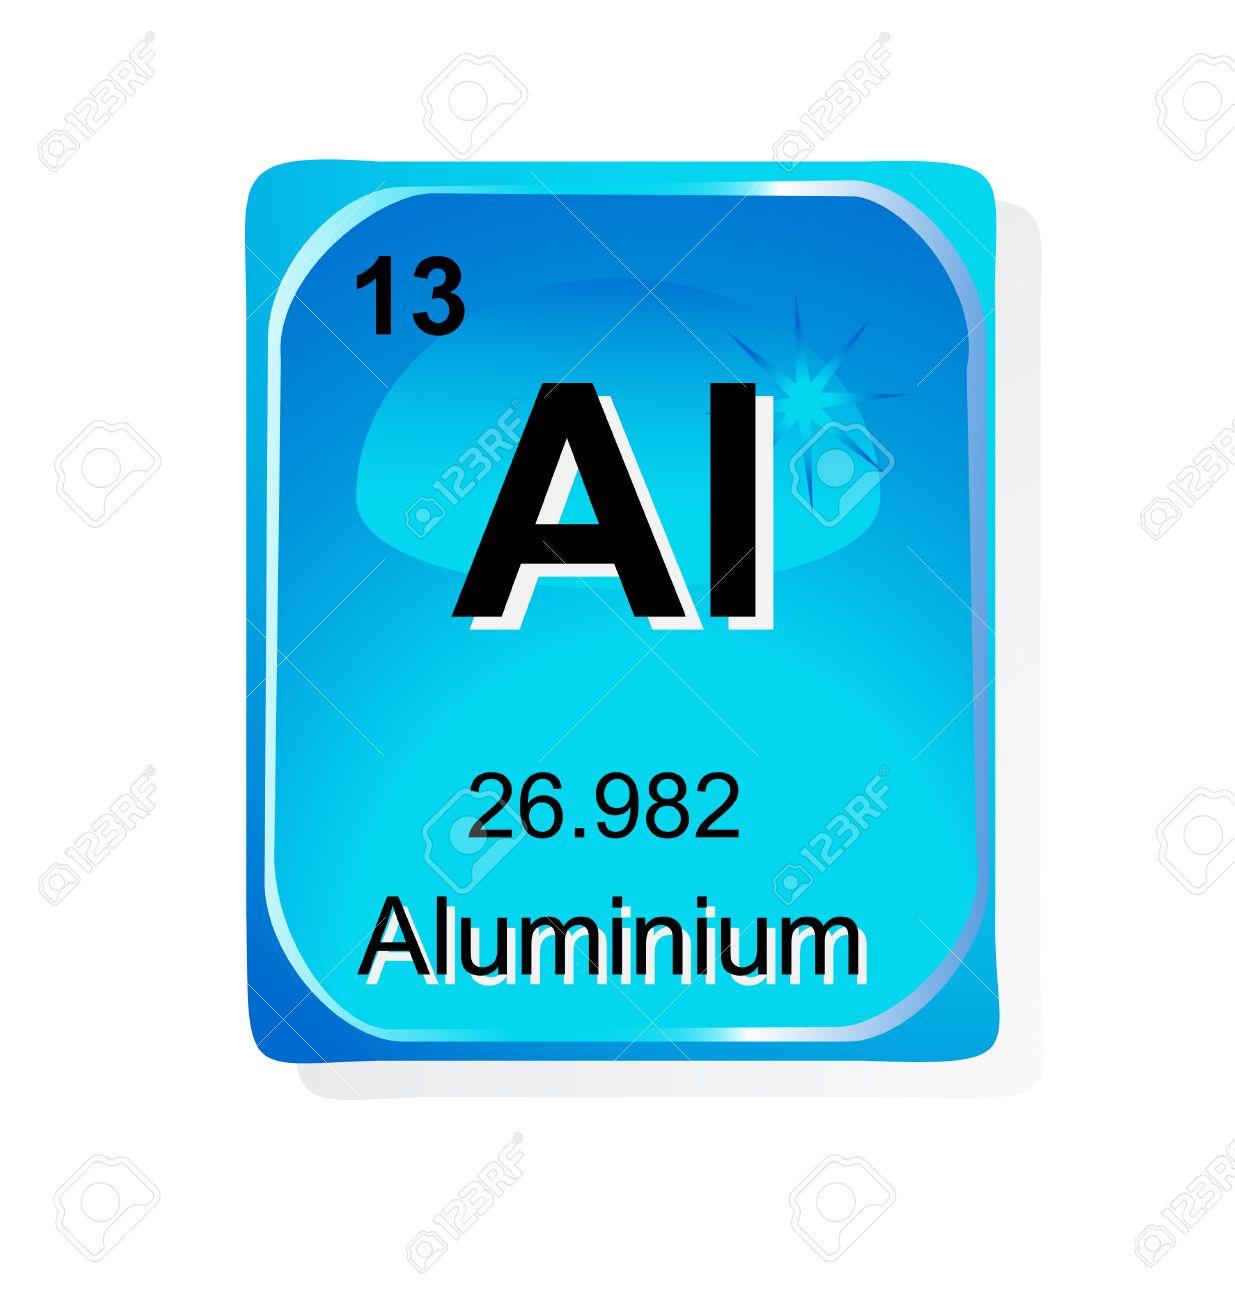 Images aluminum element symbol aluminum element keyboard source gamestrikefo Image collections